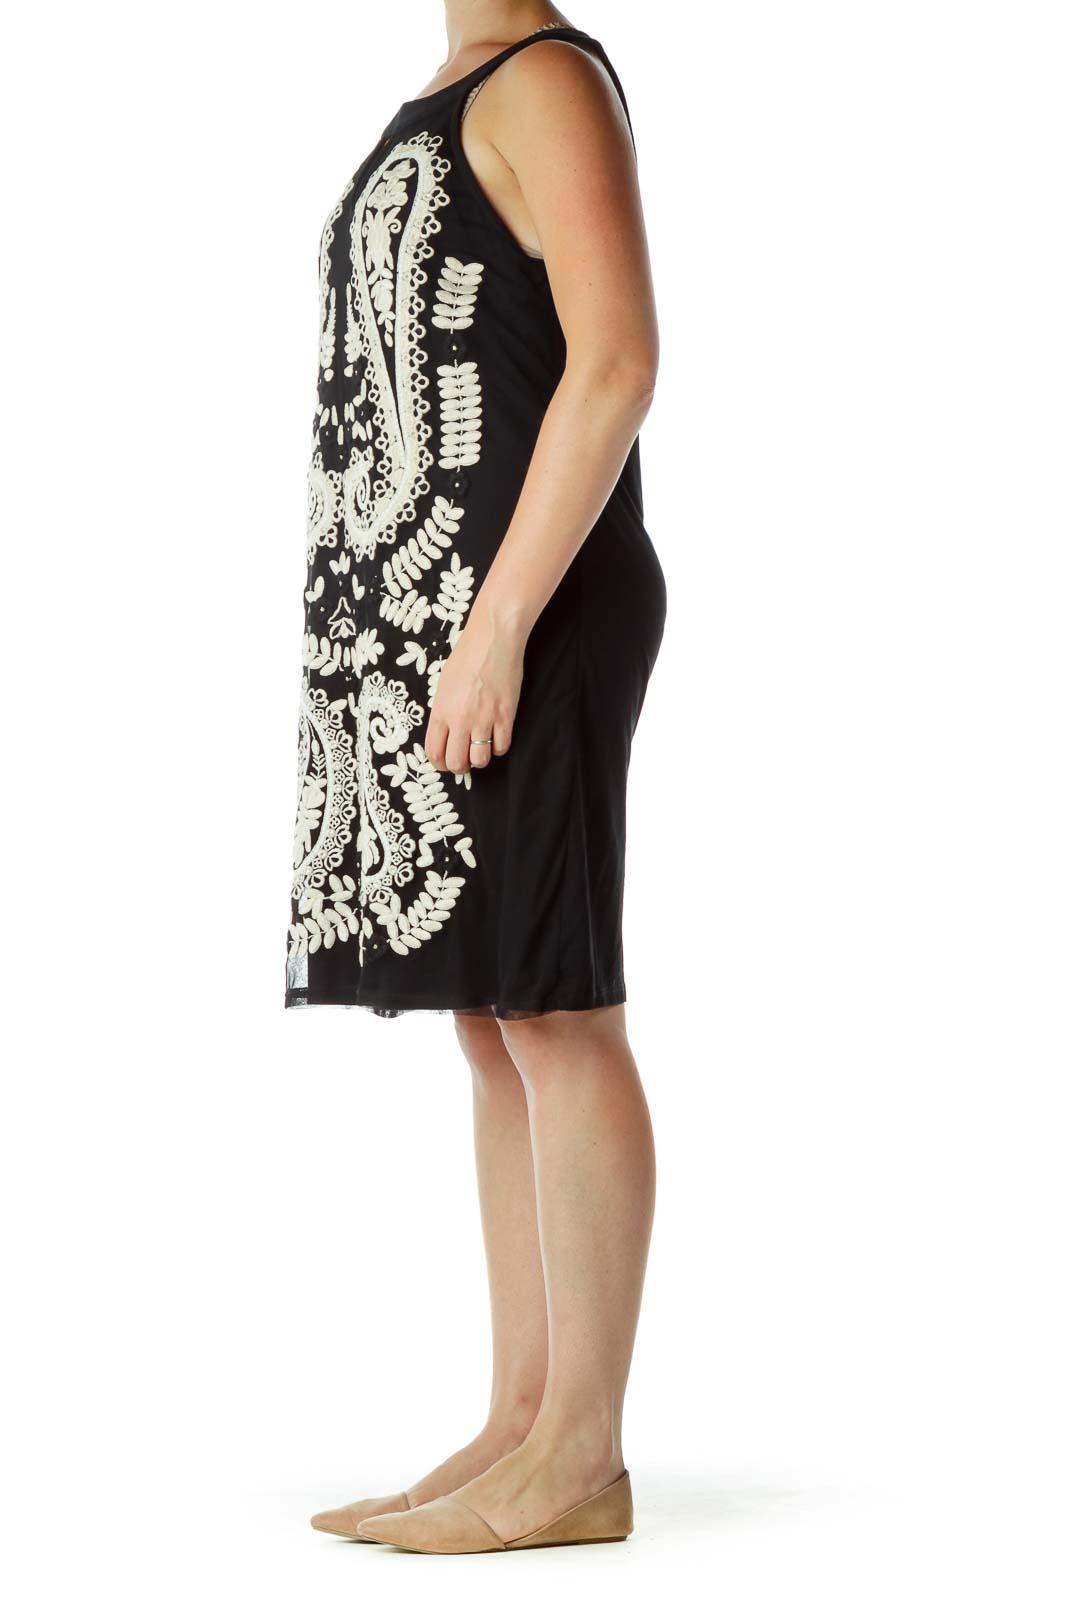 Black Cream Crocheted Shift Dress